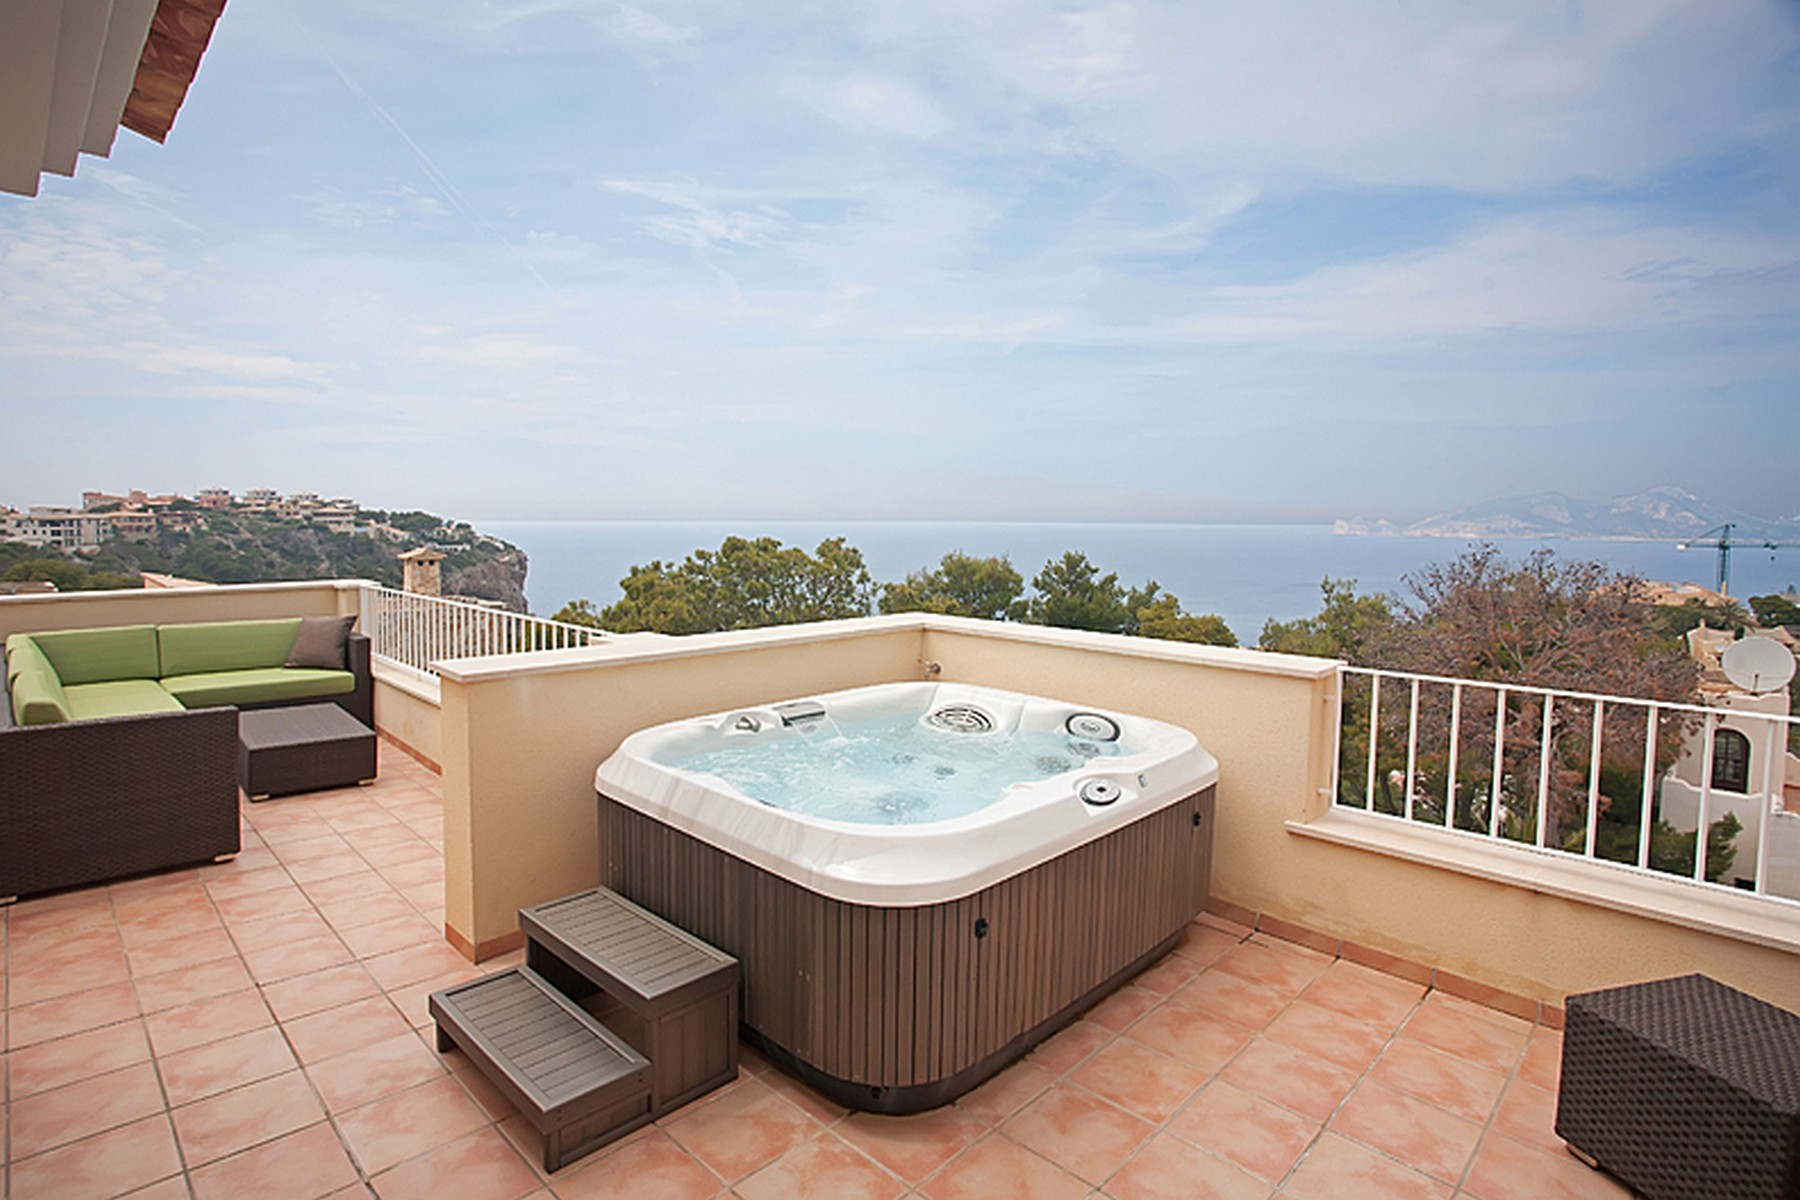 Tek Ailelik Ev için Satış at Semi-detached villa in Puerto de Andratx Port Andratx, Mallorca 07157 Ispanya